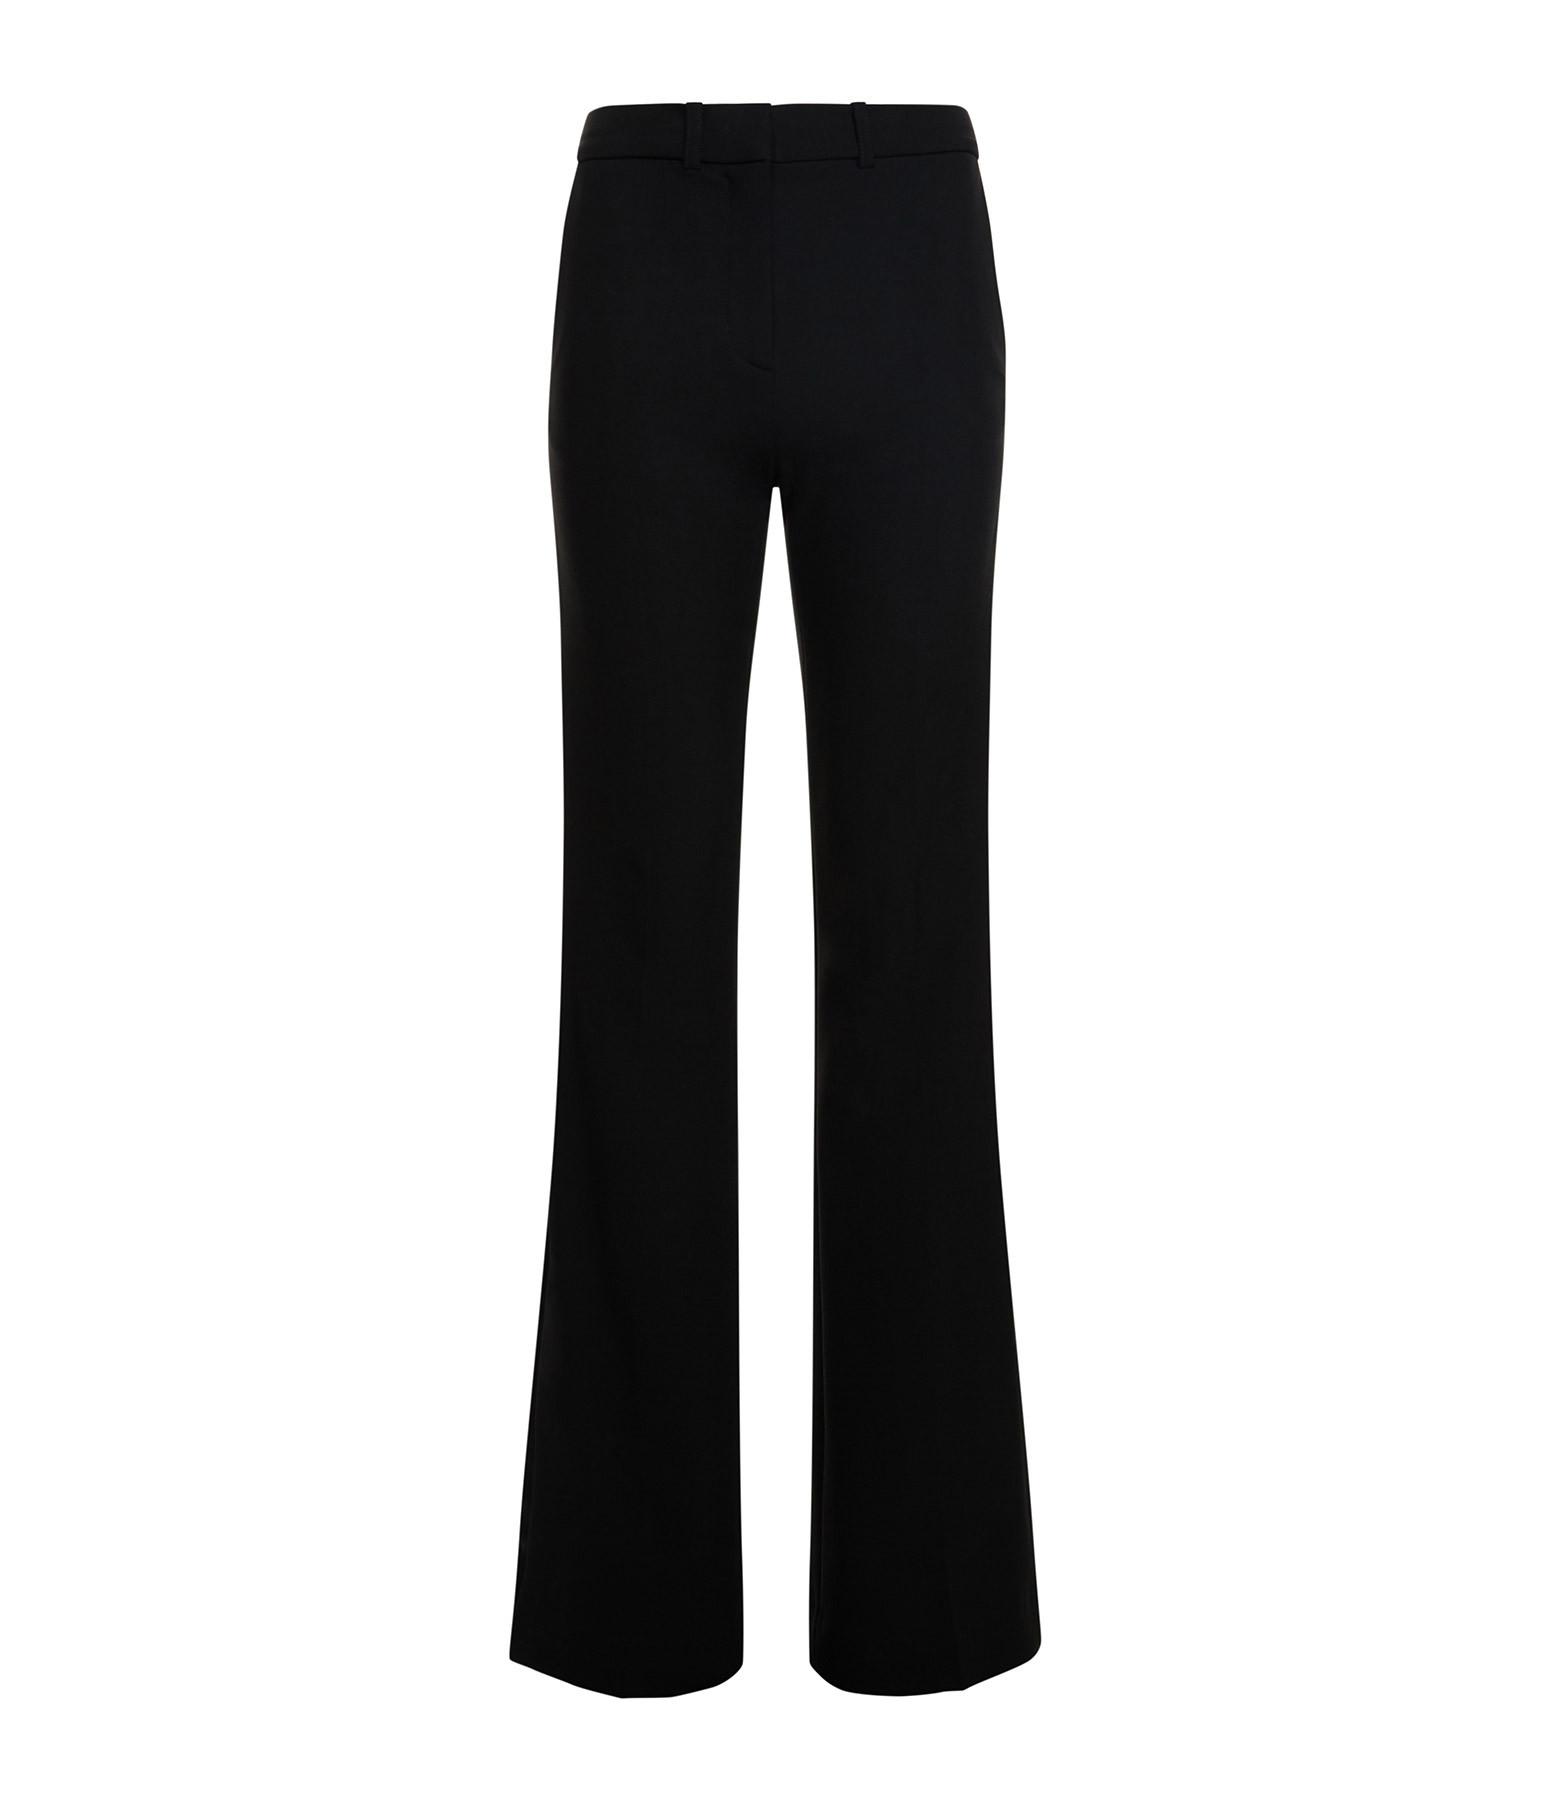 VICTORIA VICTORIA BECKHAM - Pantalon Tuxedo Noir